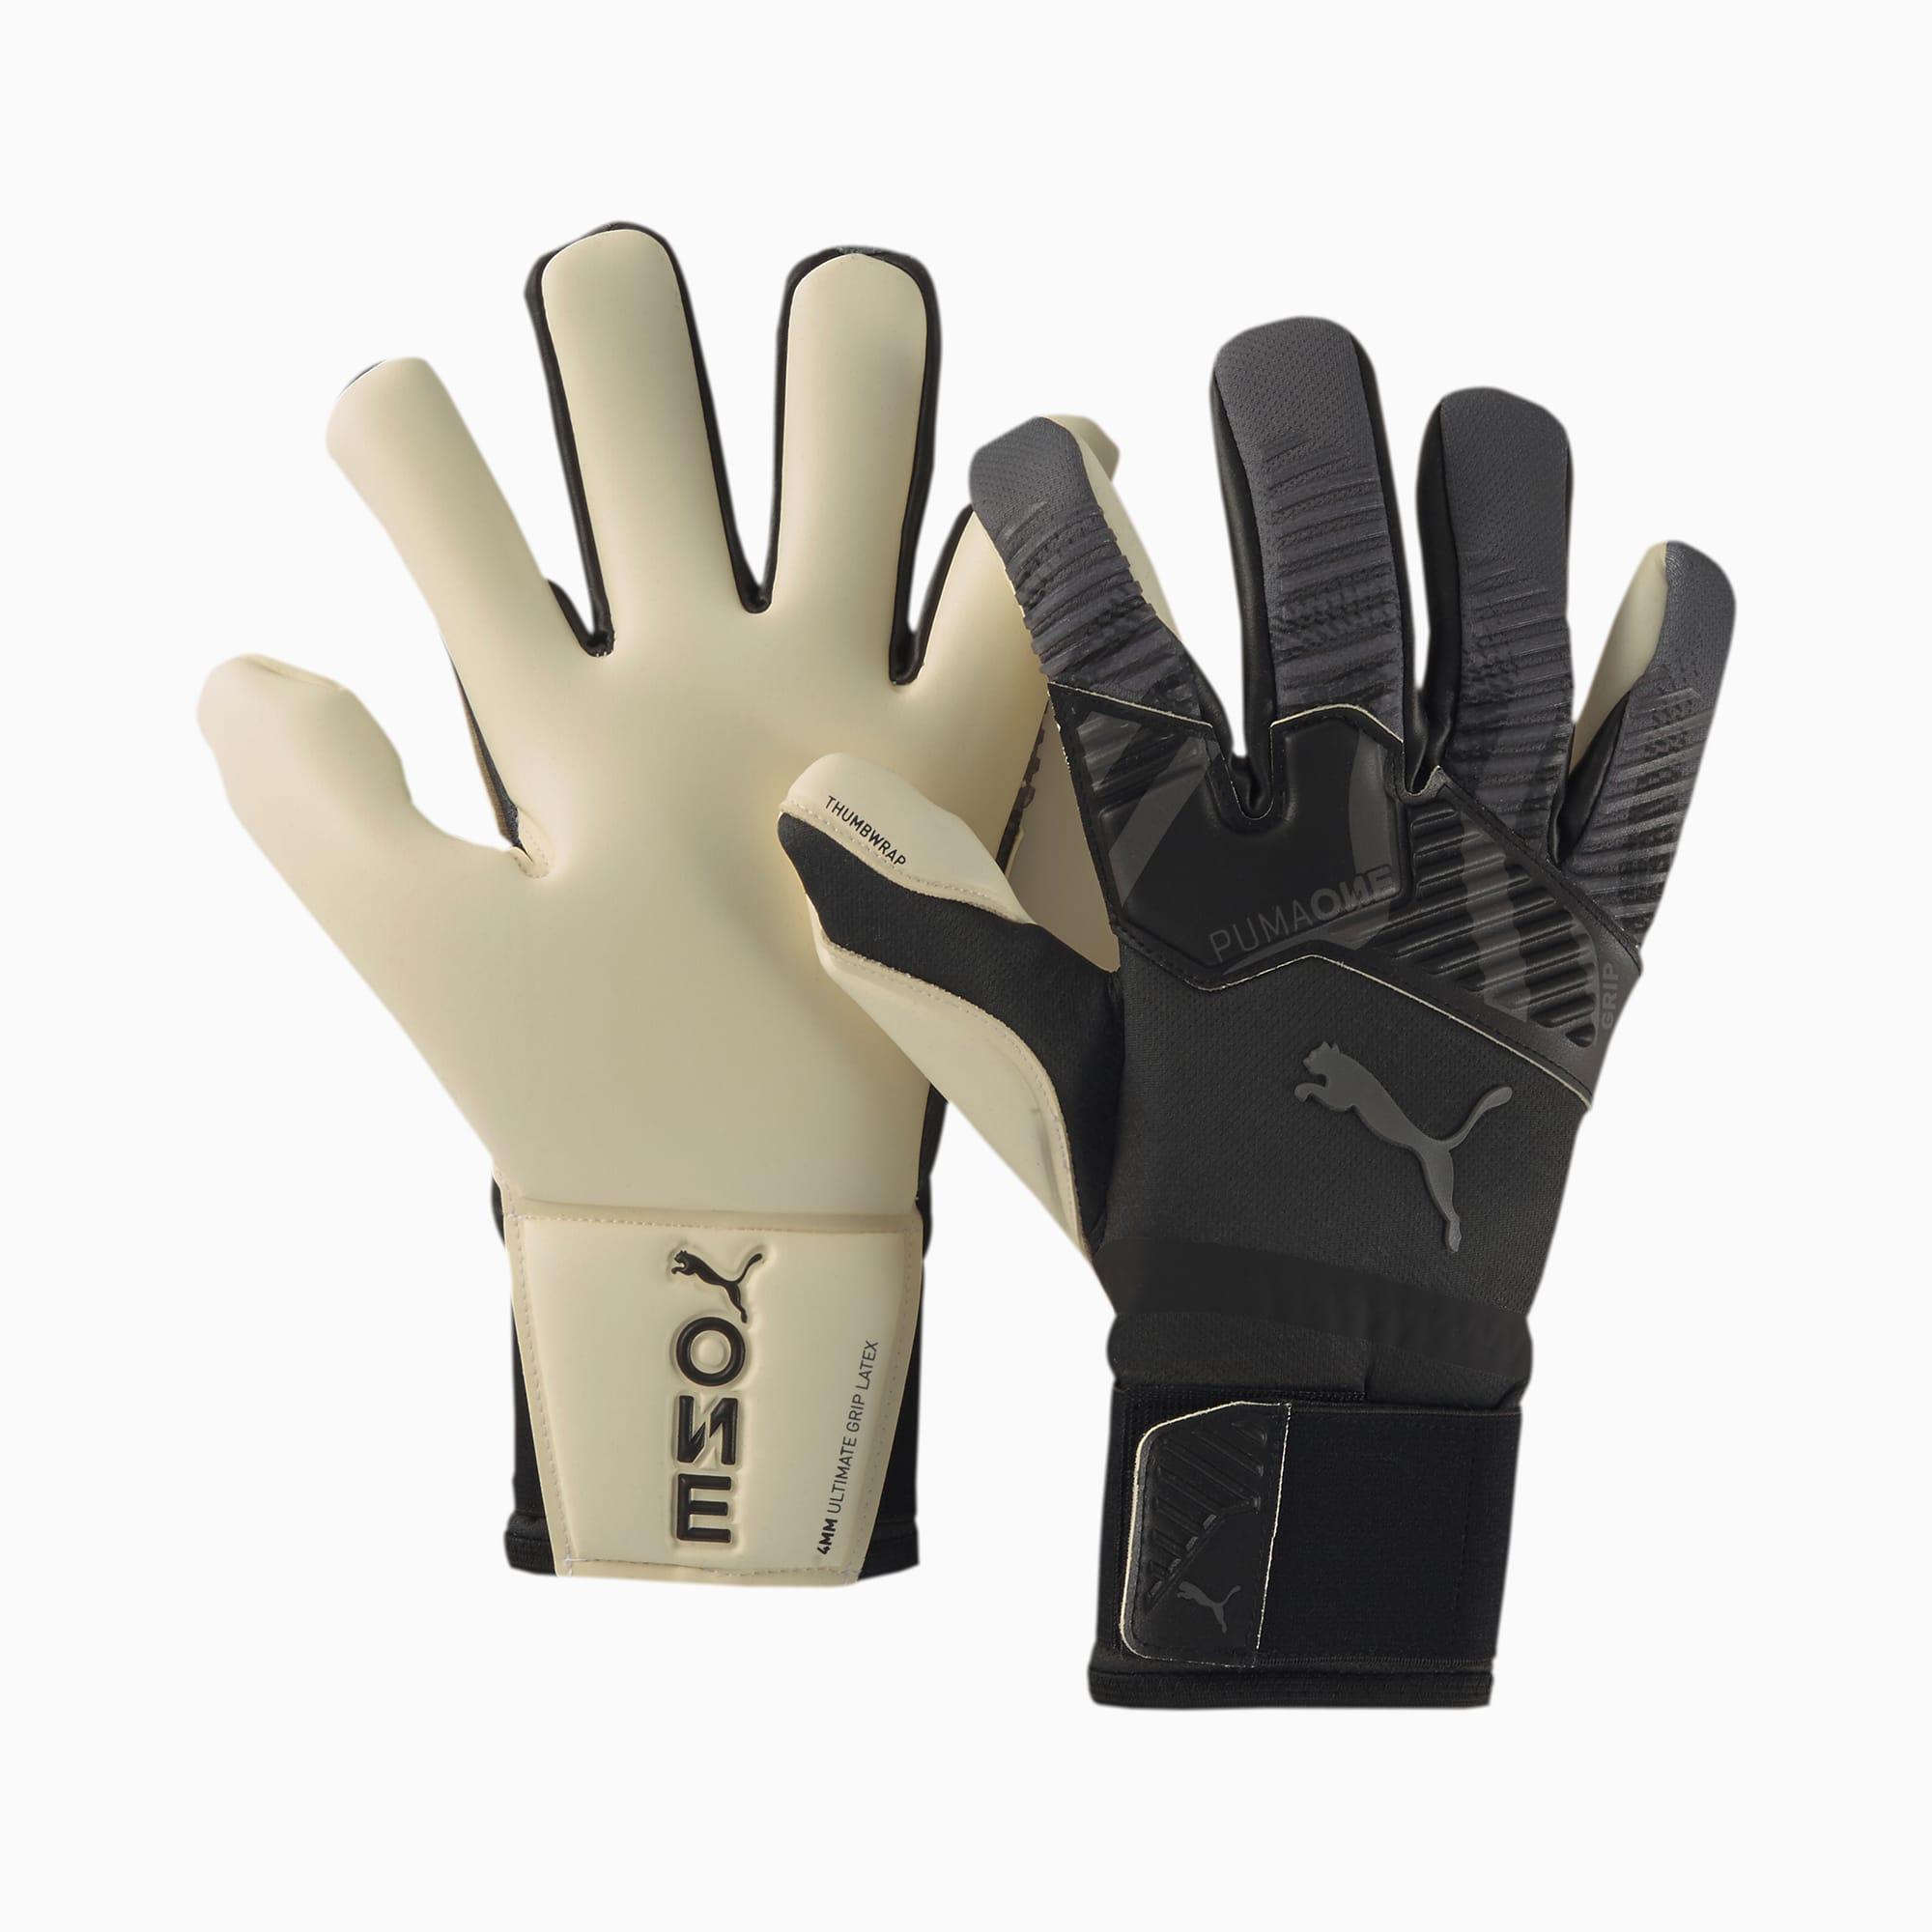 PUMA ONE Grip 1 Hybrid Pro Goalkeeper Gloves | PUMA Shoes | PUMA ...